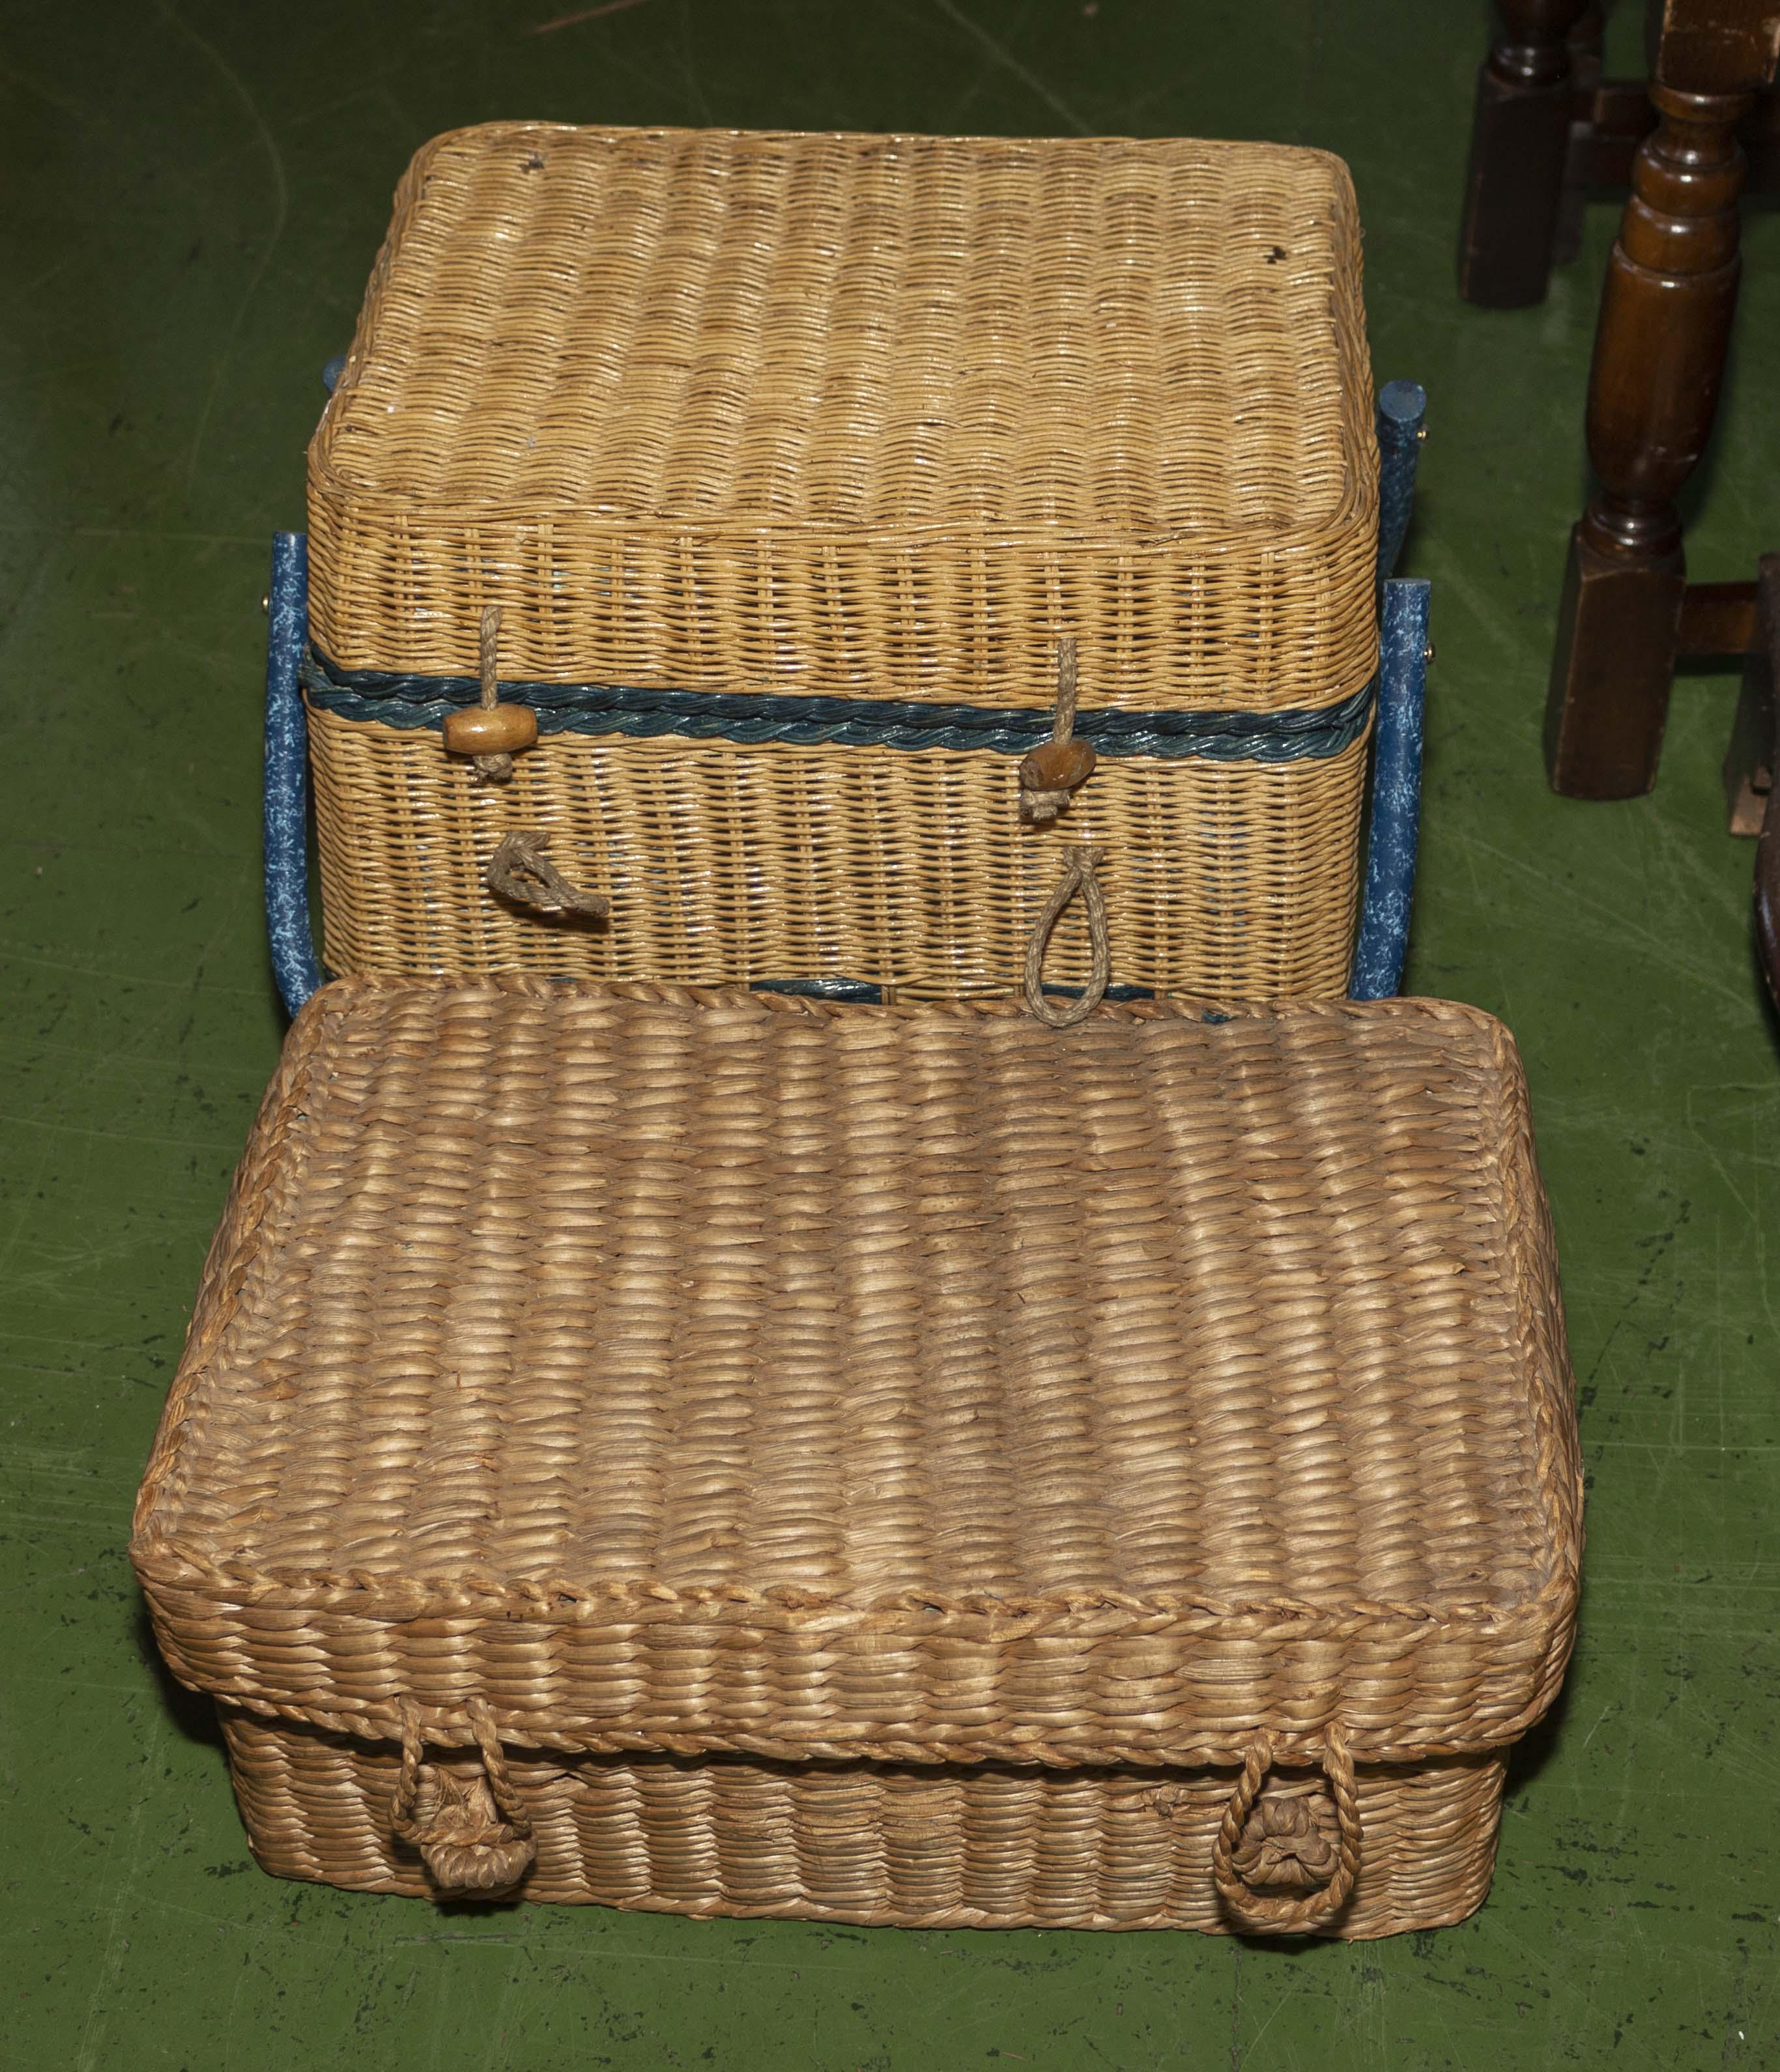 Lot 47 - Two wicker picnic baskets